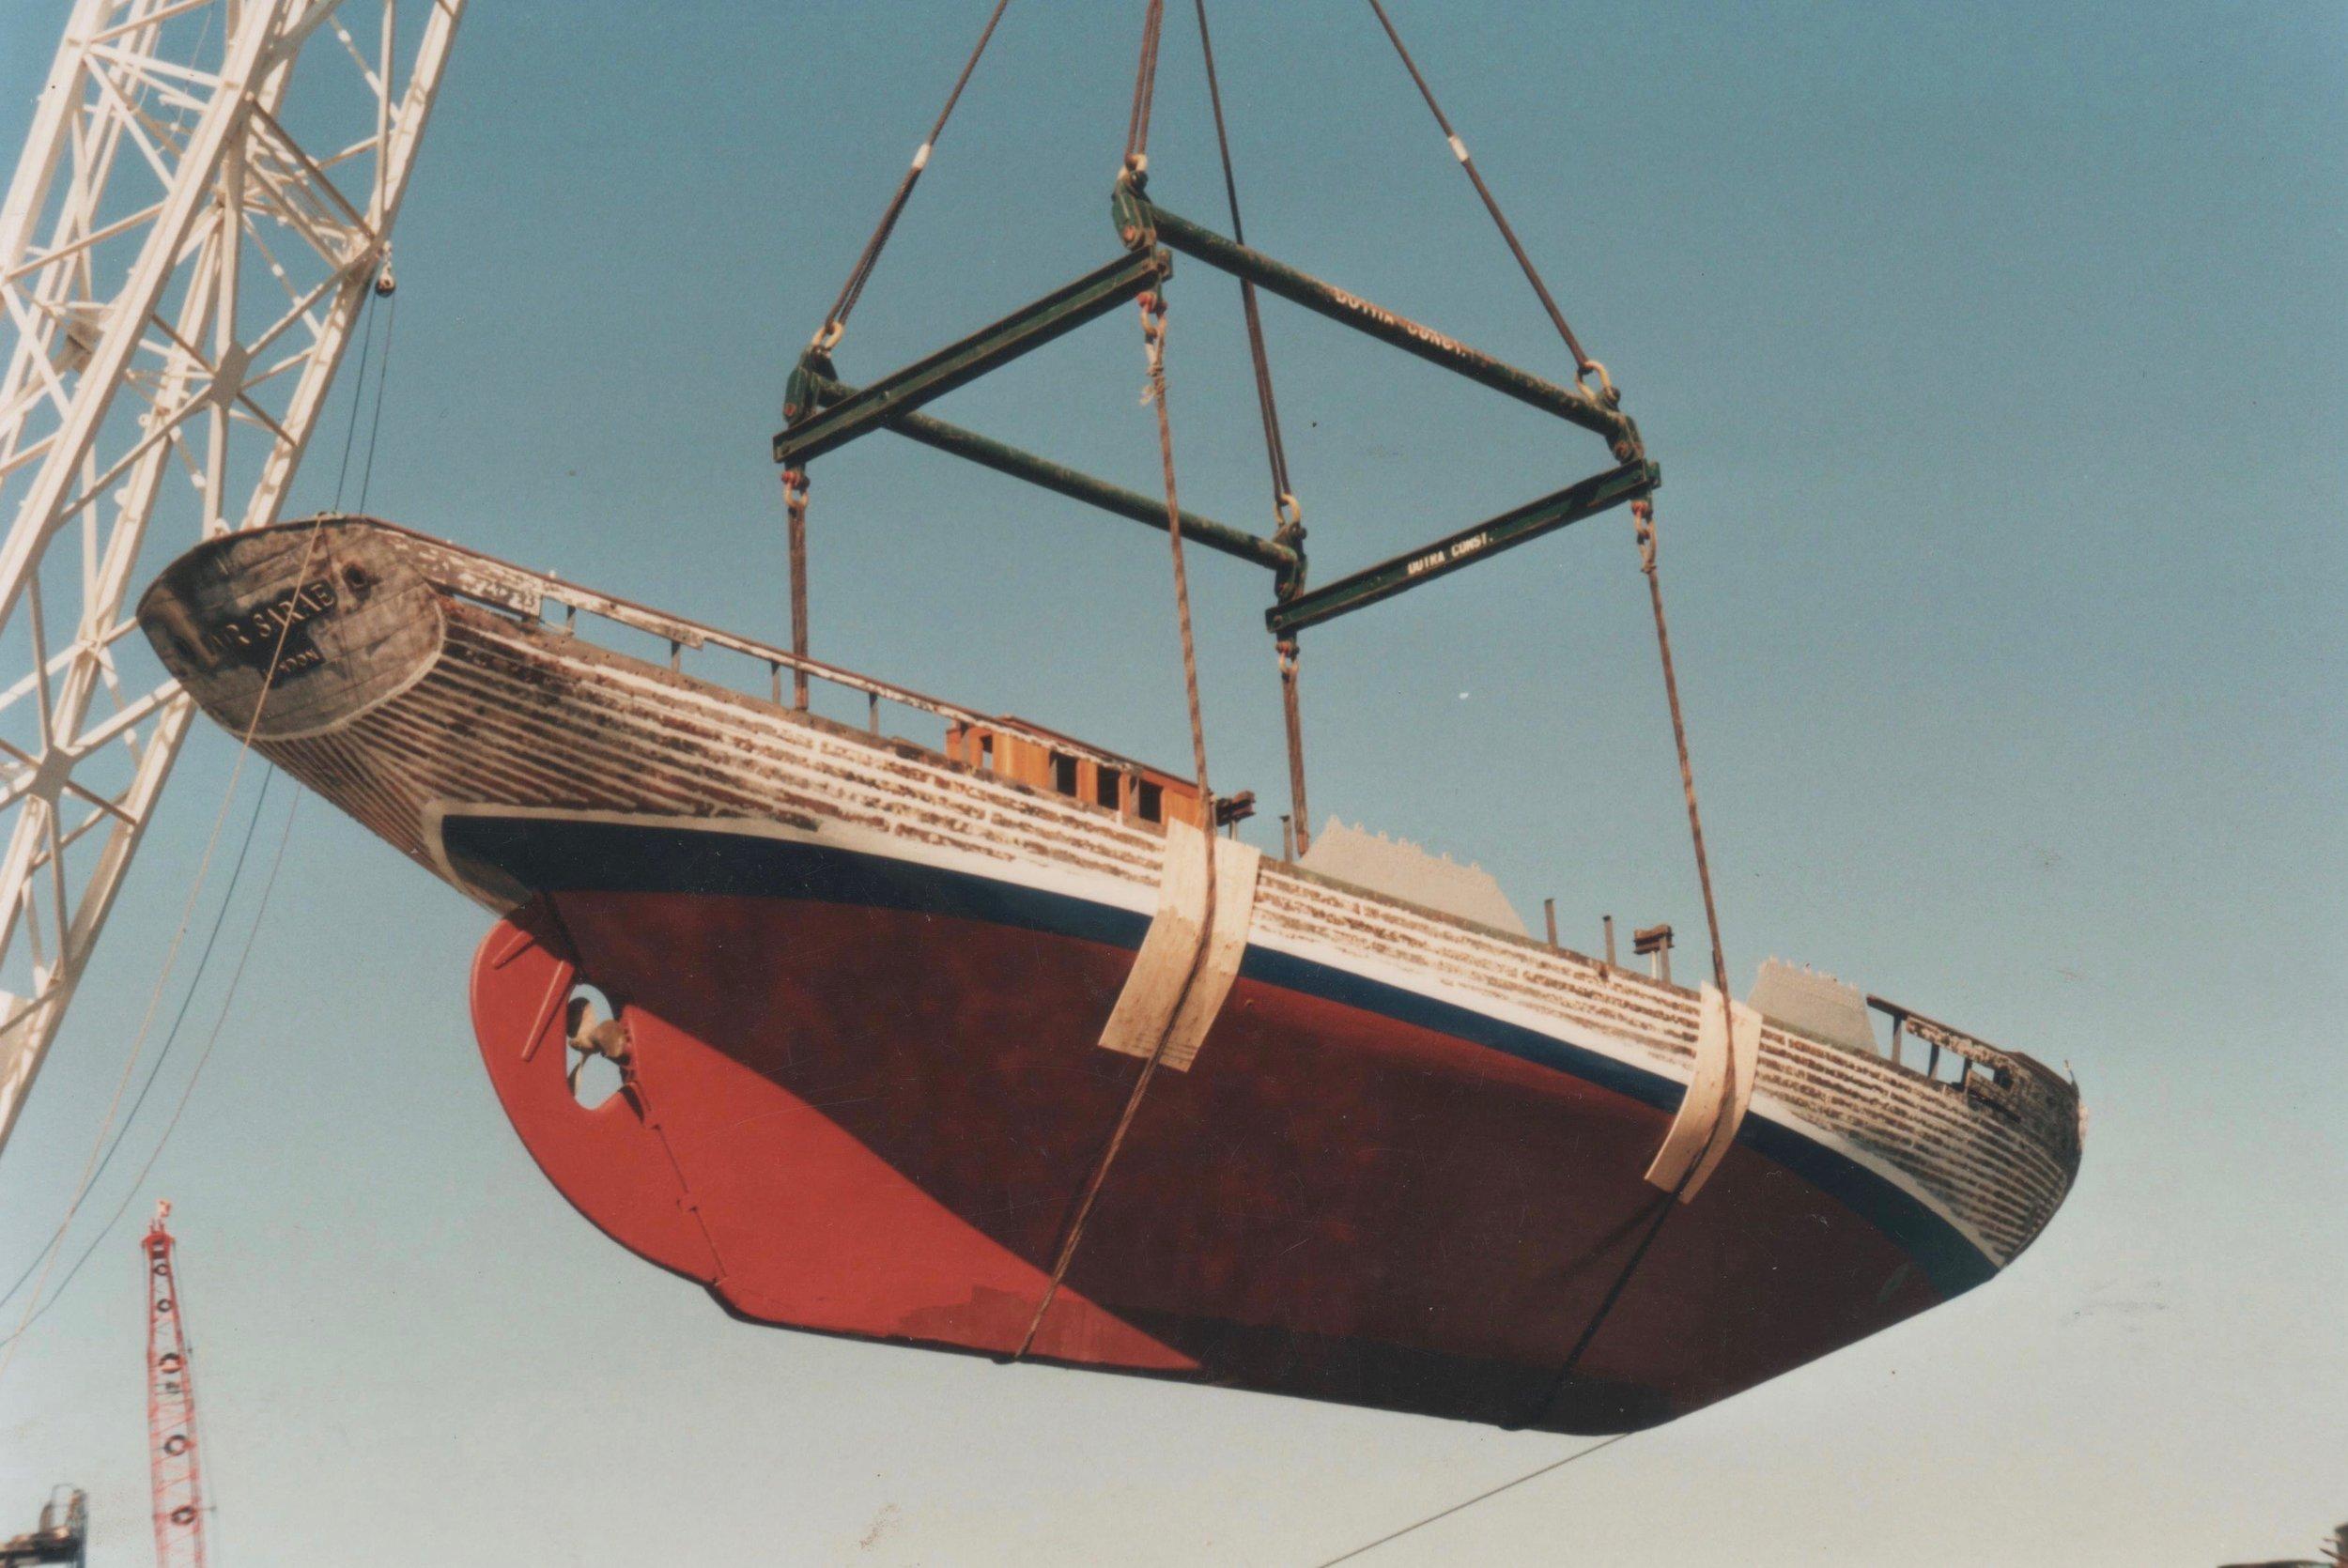 EROS swinging high 001.jpg